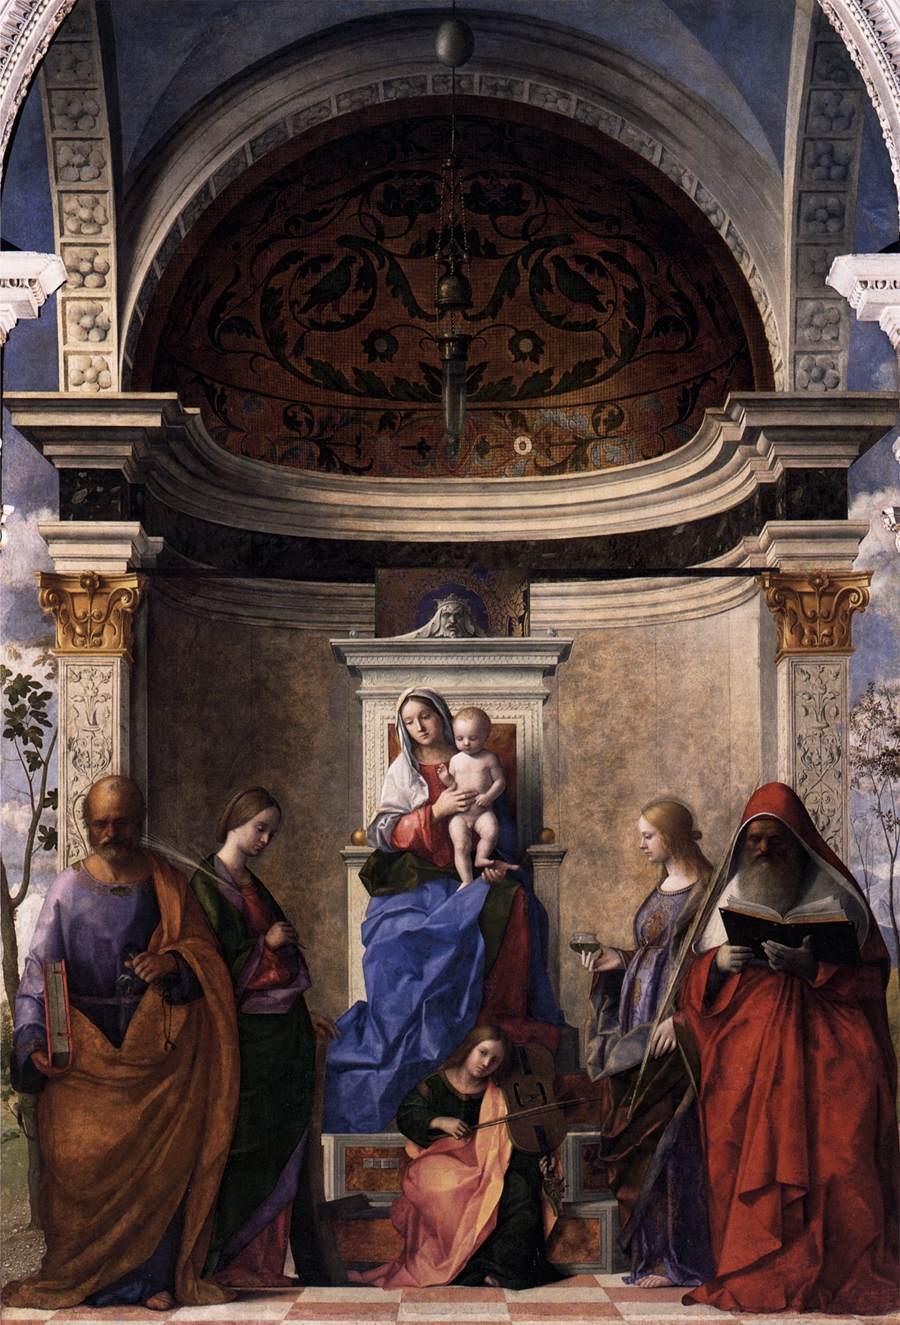 http://www.wga.hu/art/b/bellini/giovanni/1500-09/zaccaria/183madon.jpg